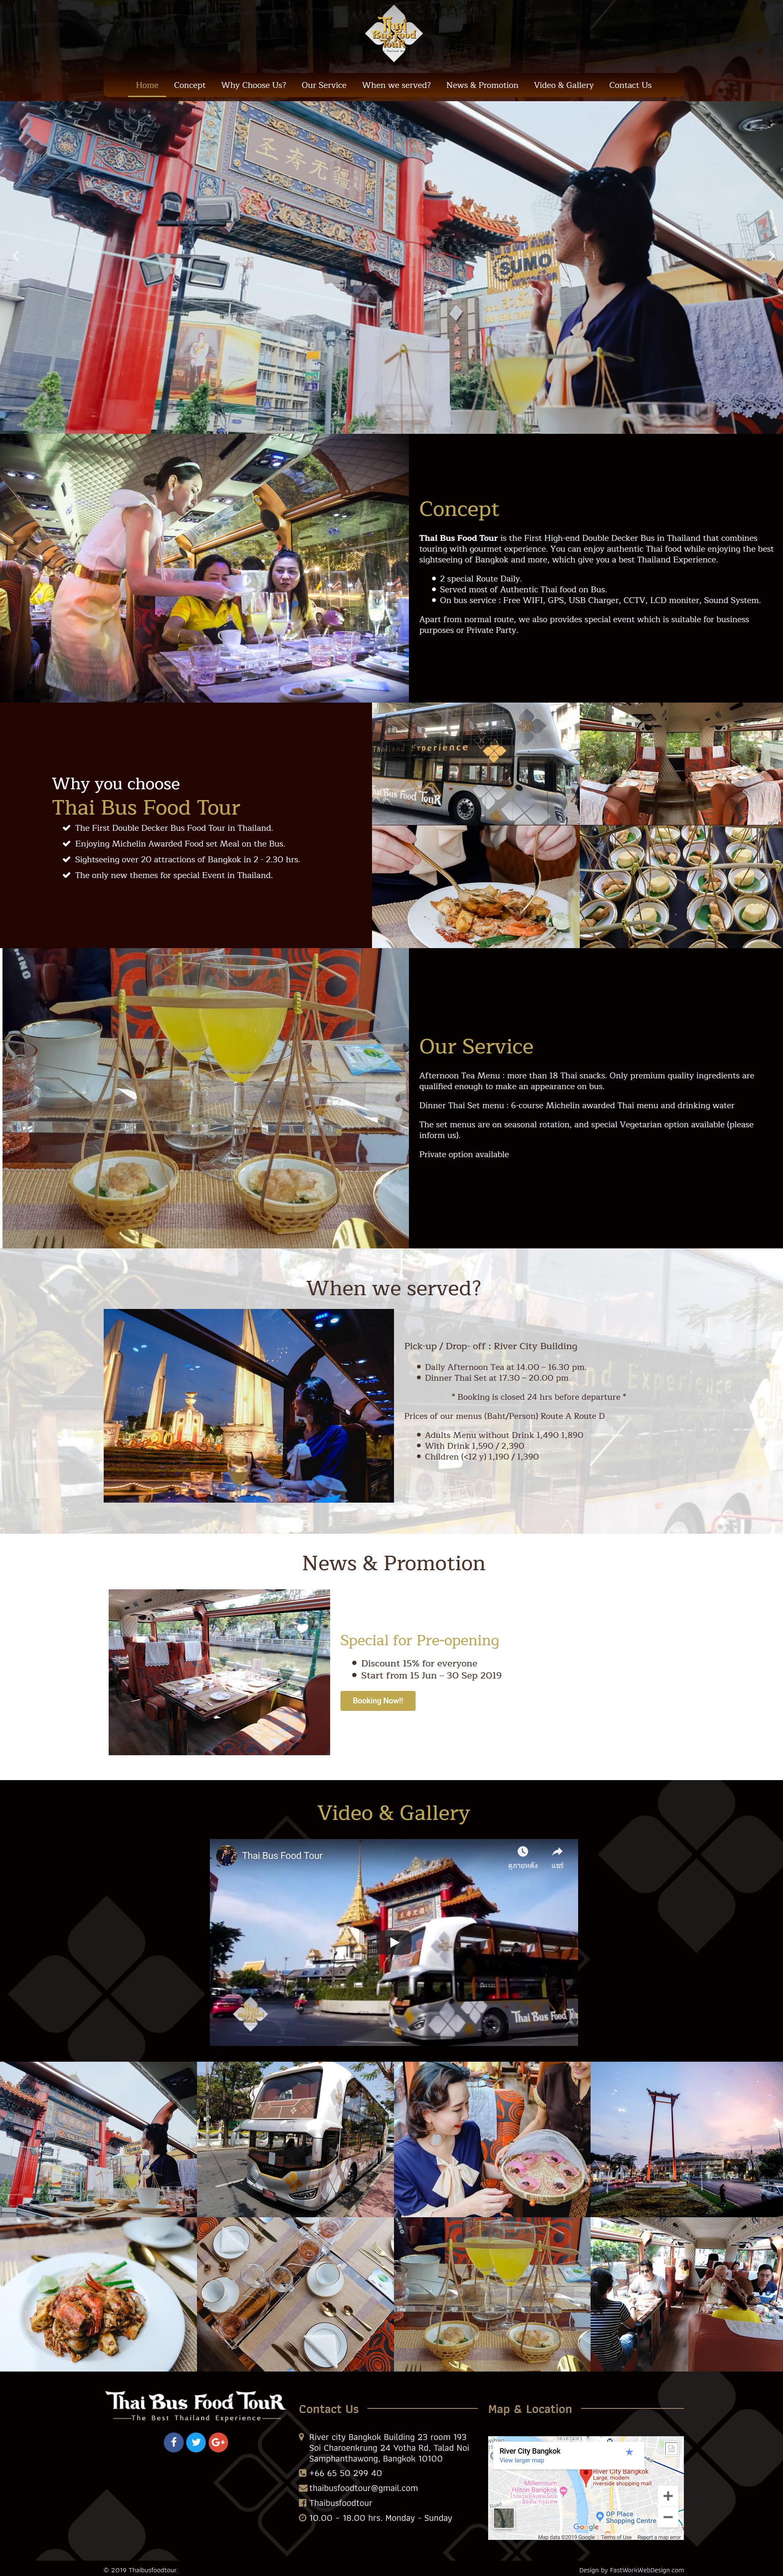 thaibusfoodtour